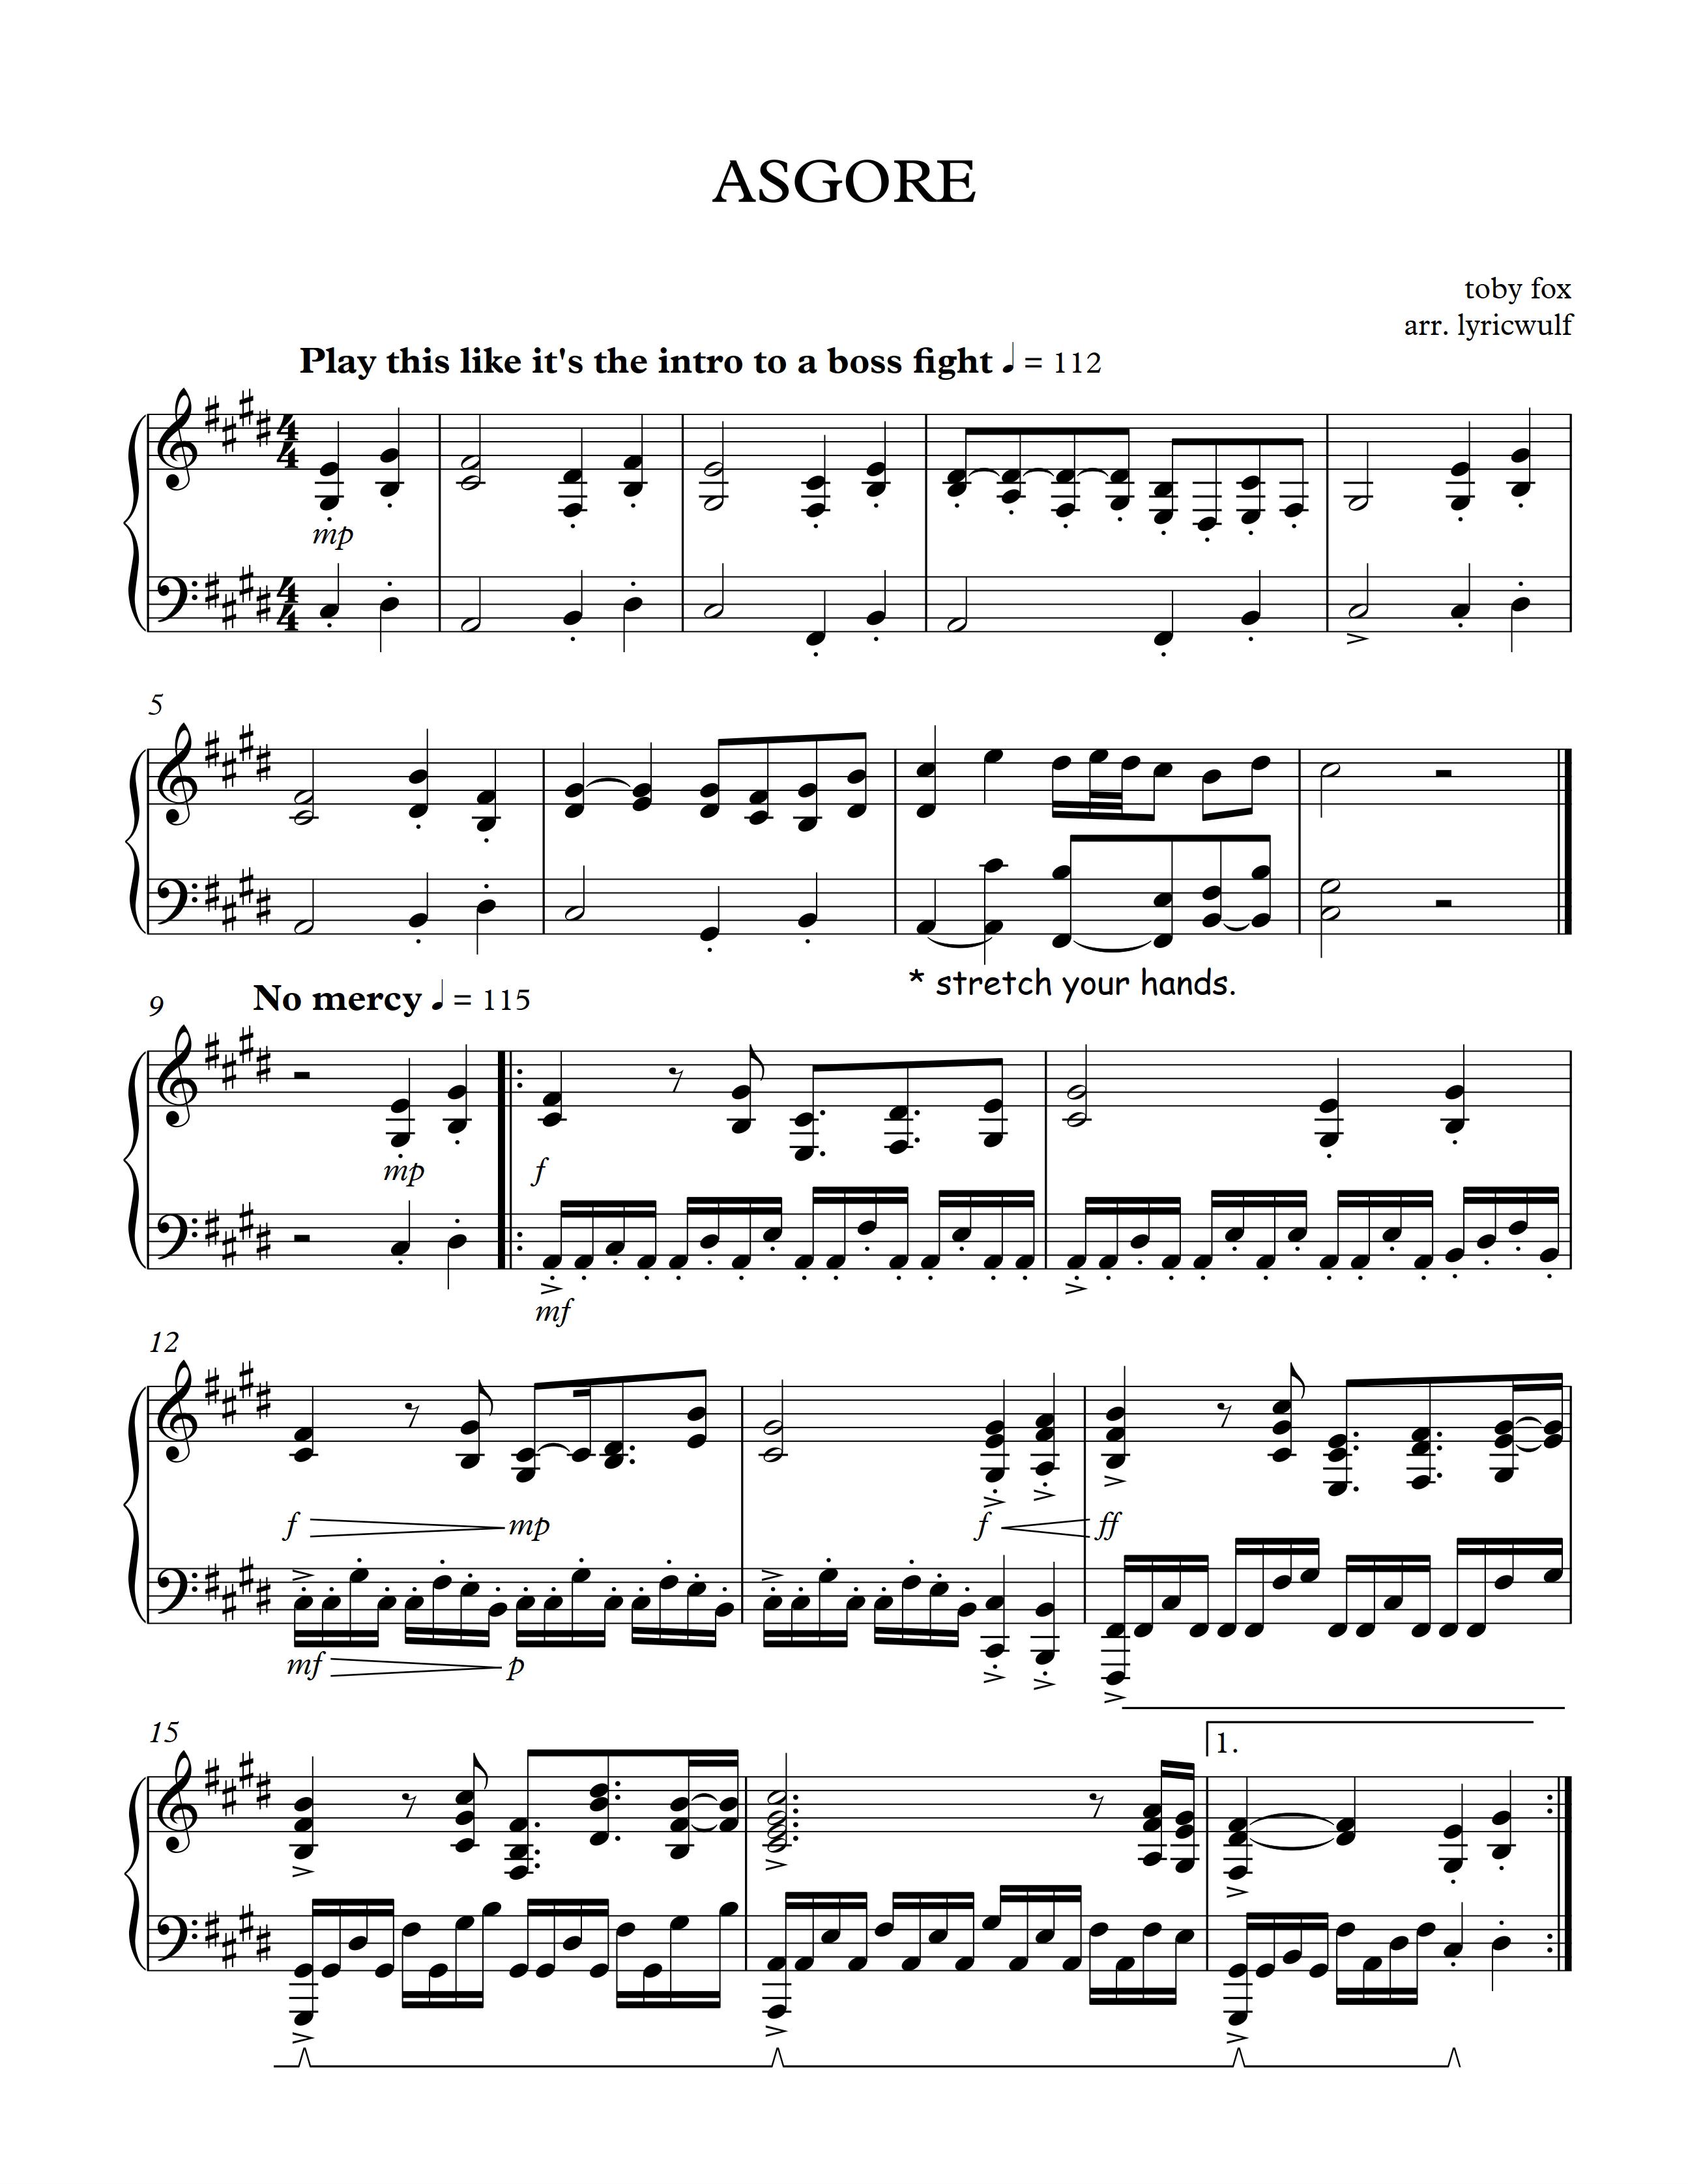 ASGORE theme sheet music 楽譜 ピアノ, ピアノ楽譜